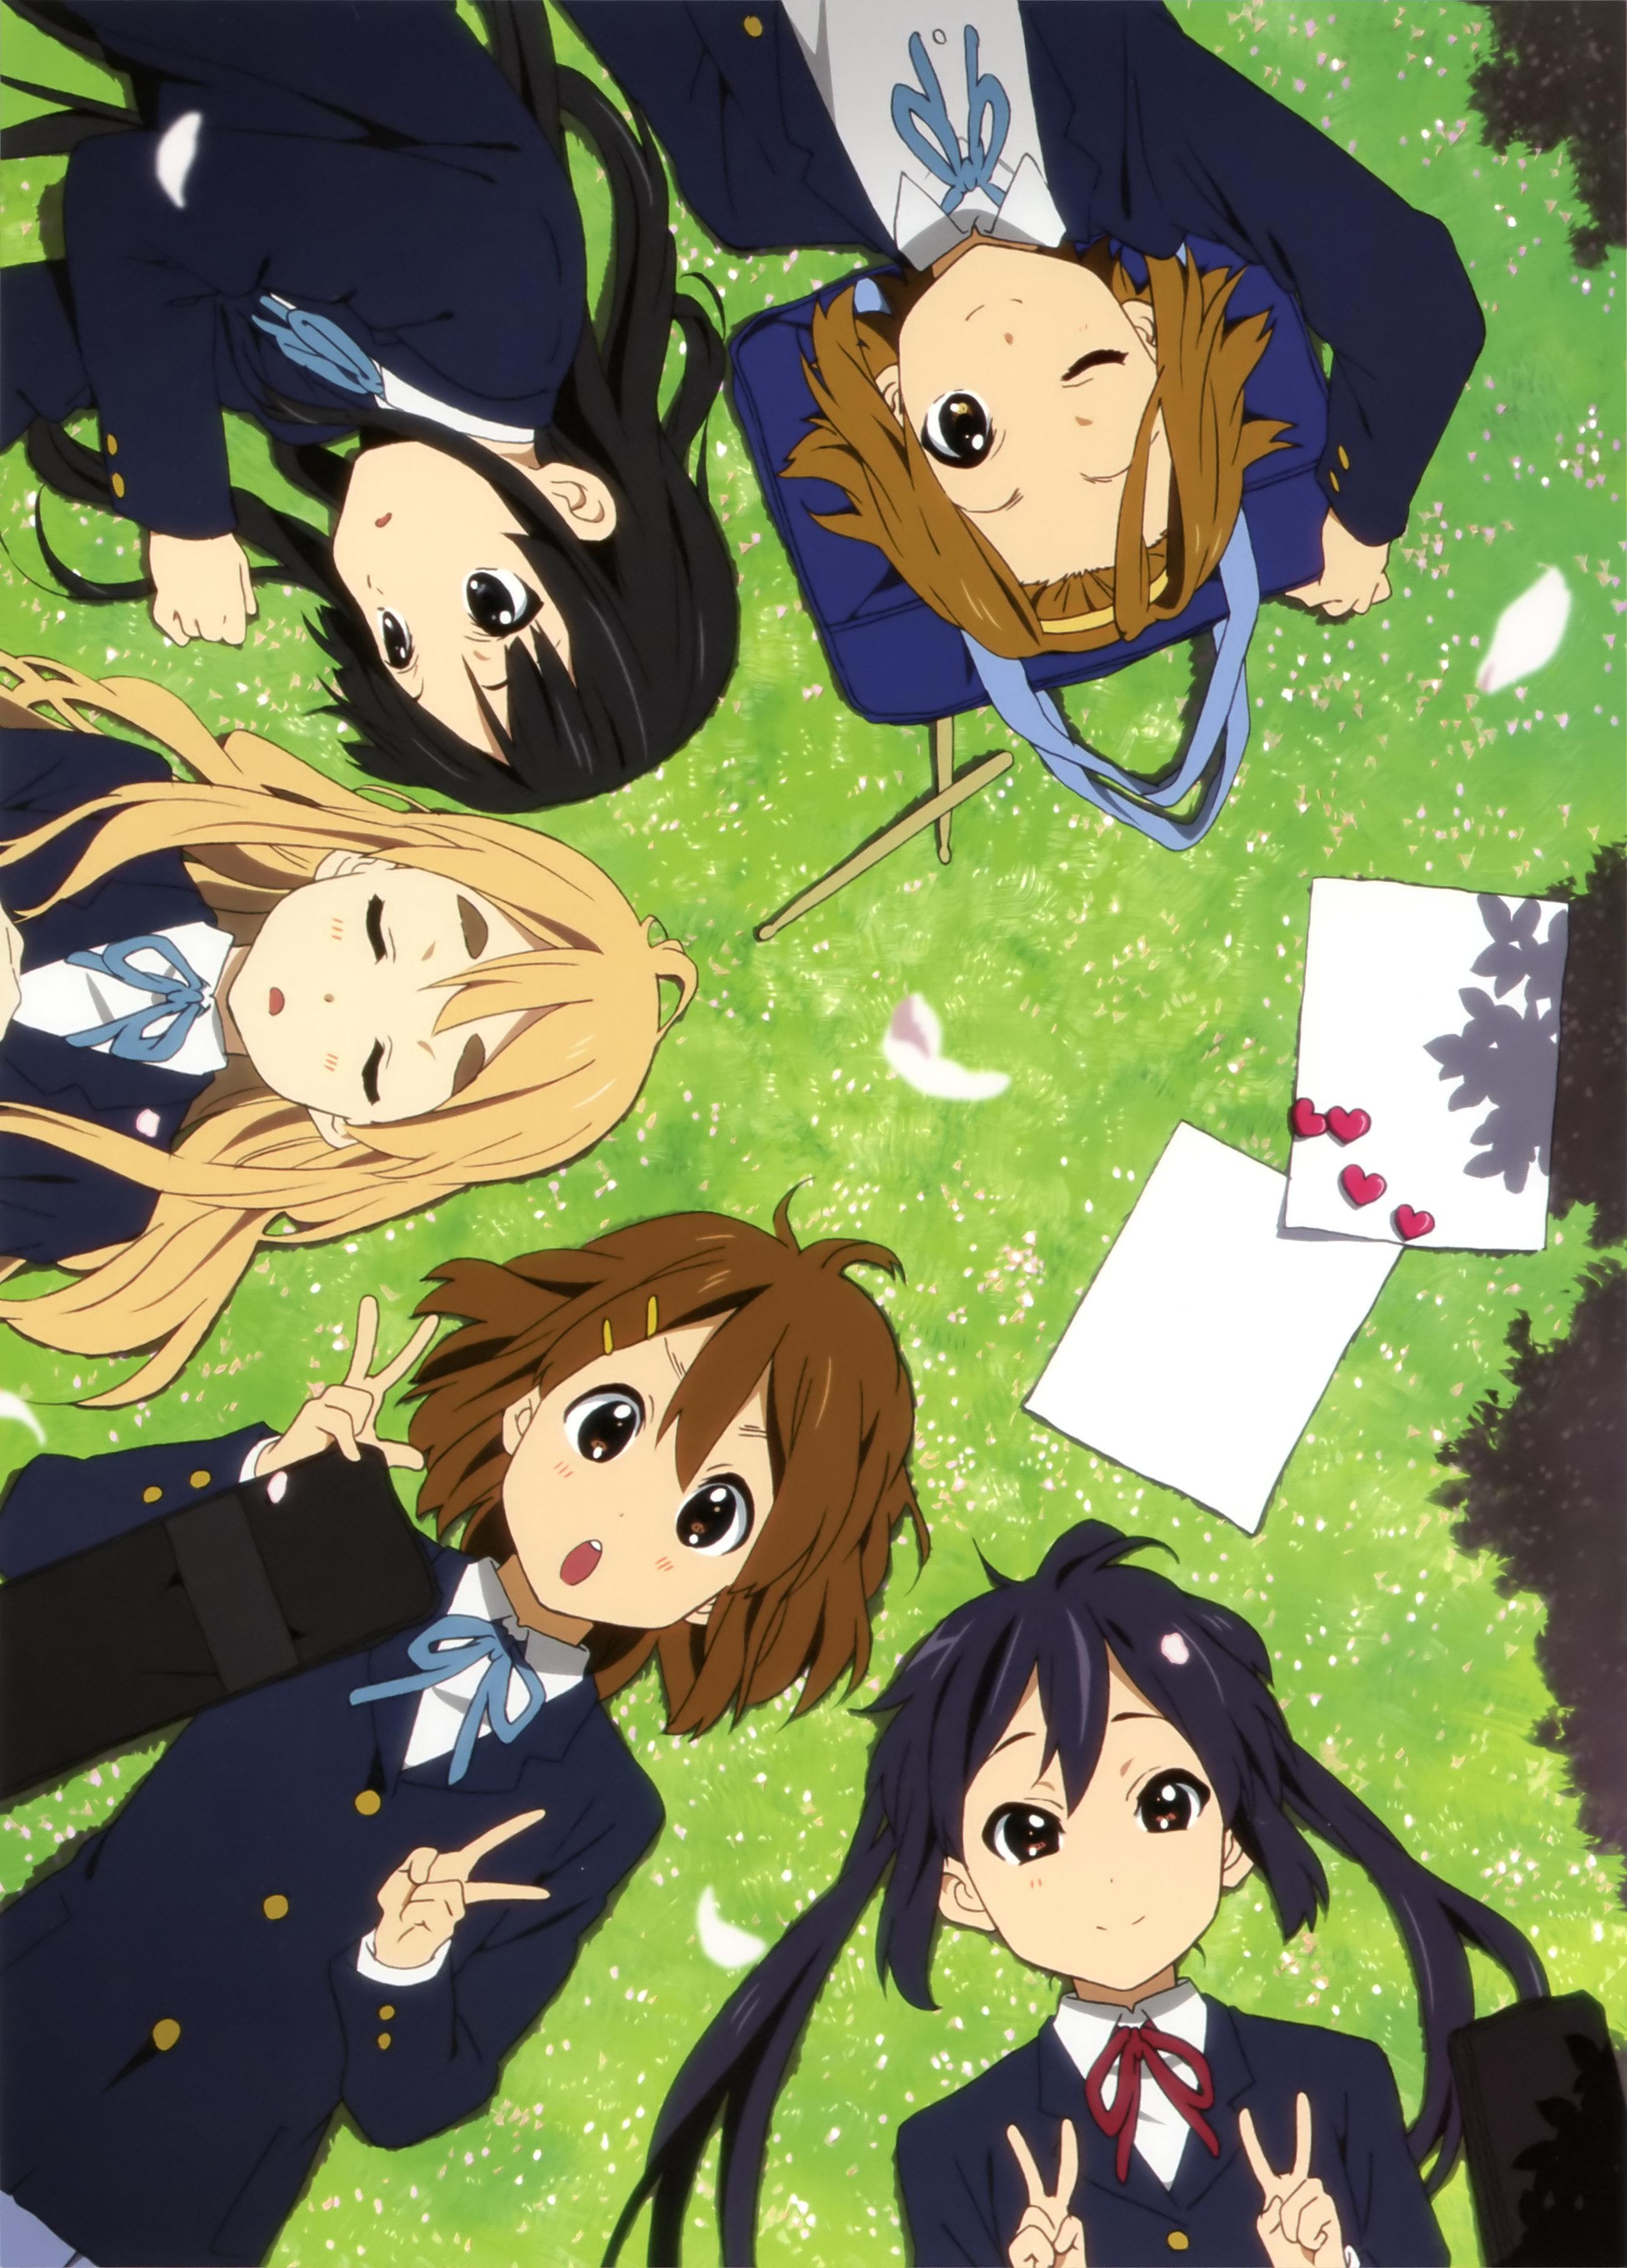 Akiyama Mio Mio Akiyama Mobile Wallpaper Zerochan Anime Image